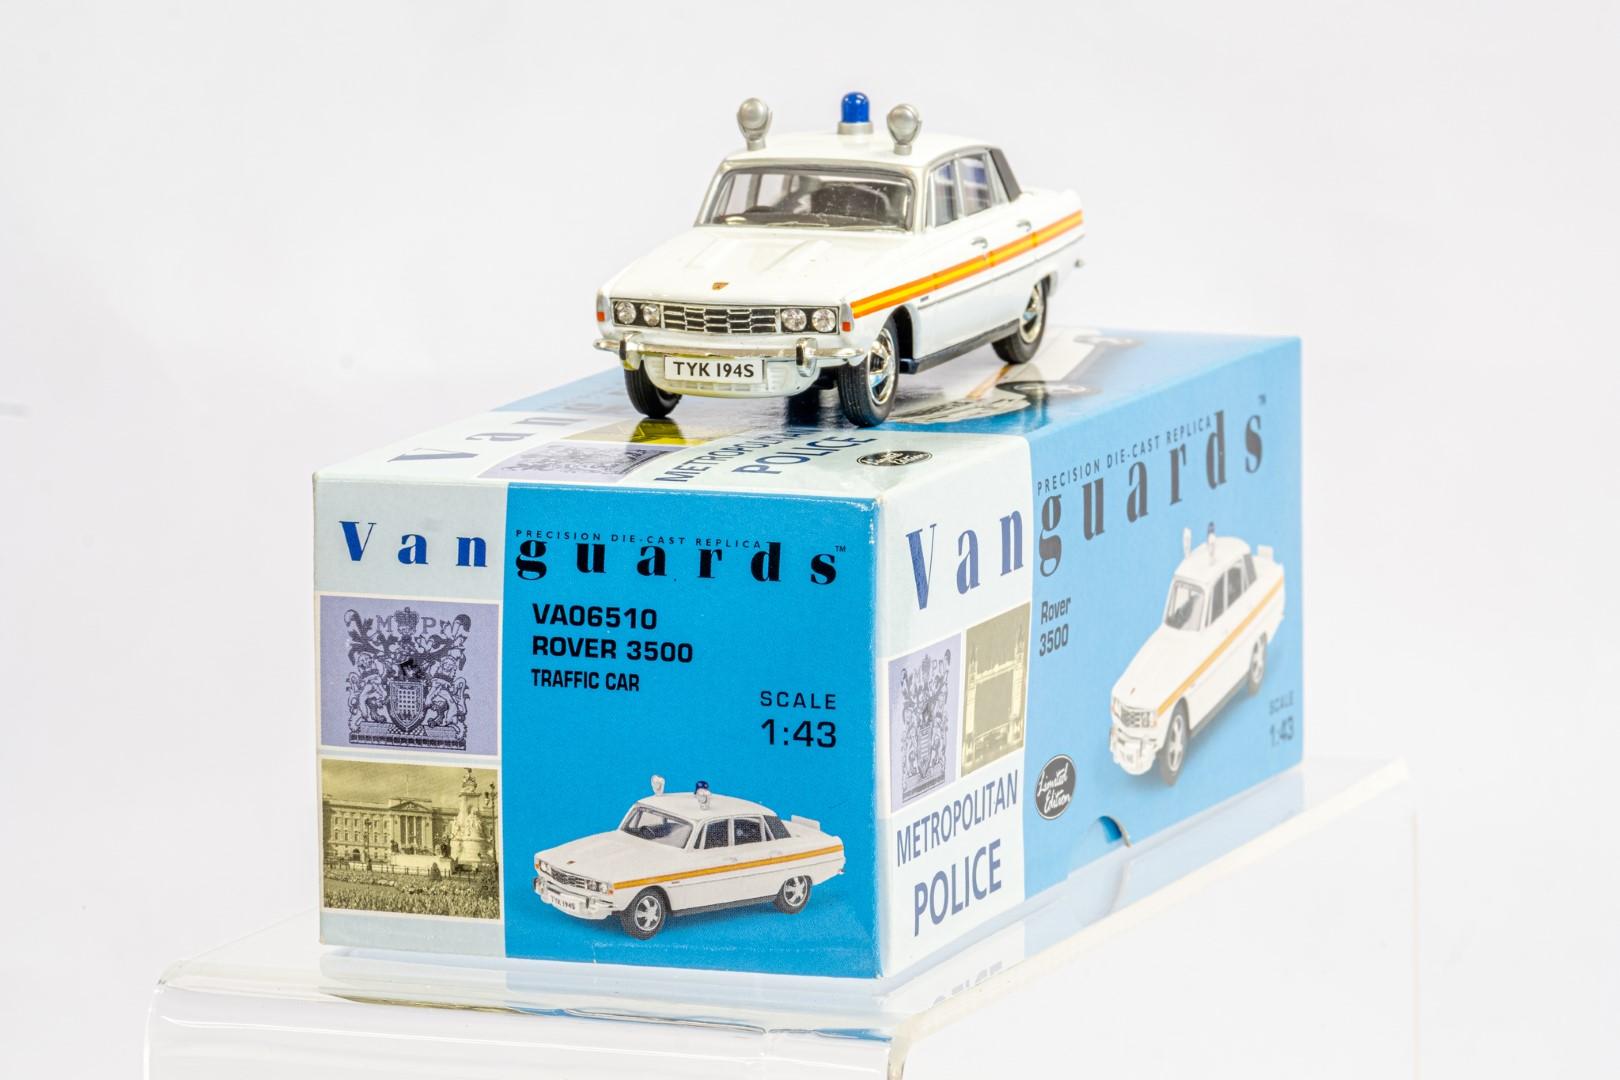 Vanguards Rover 3500 - Traffic Car - Image 3 of 8